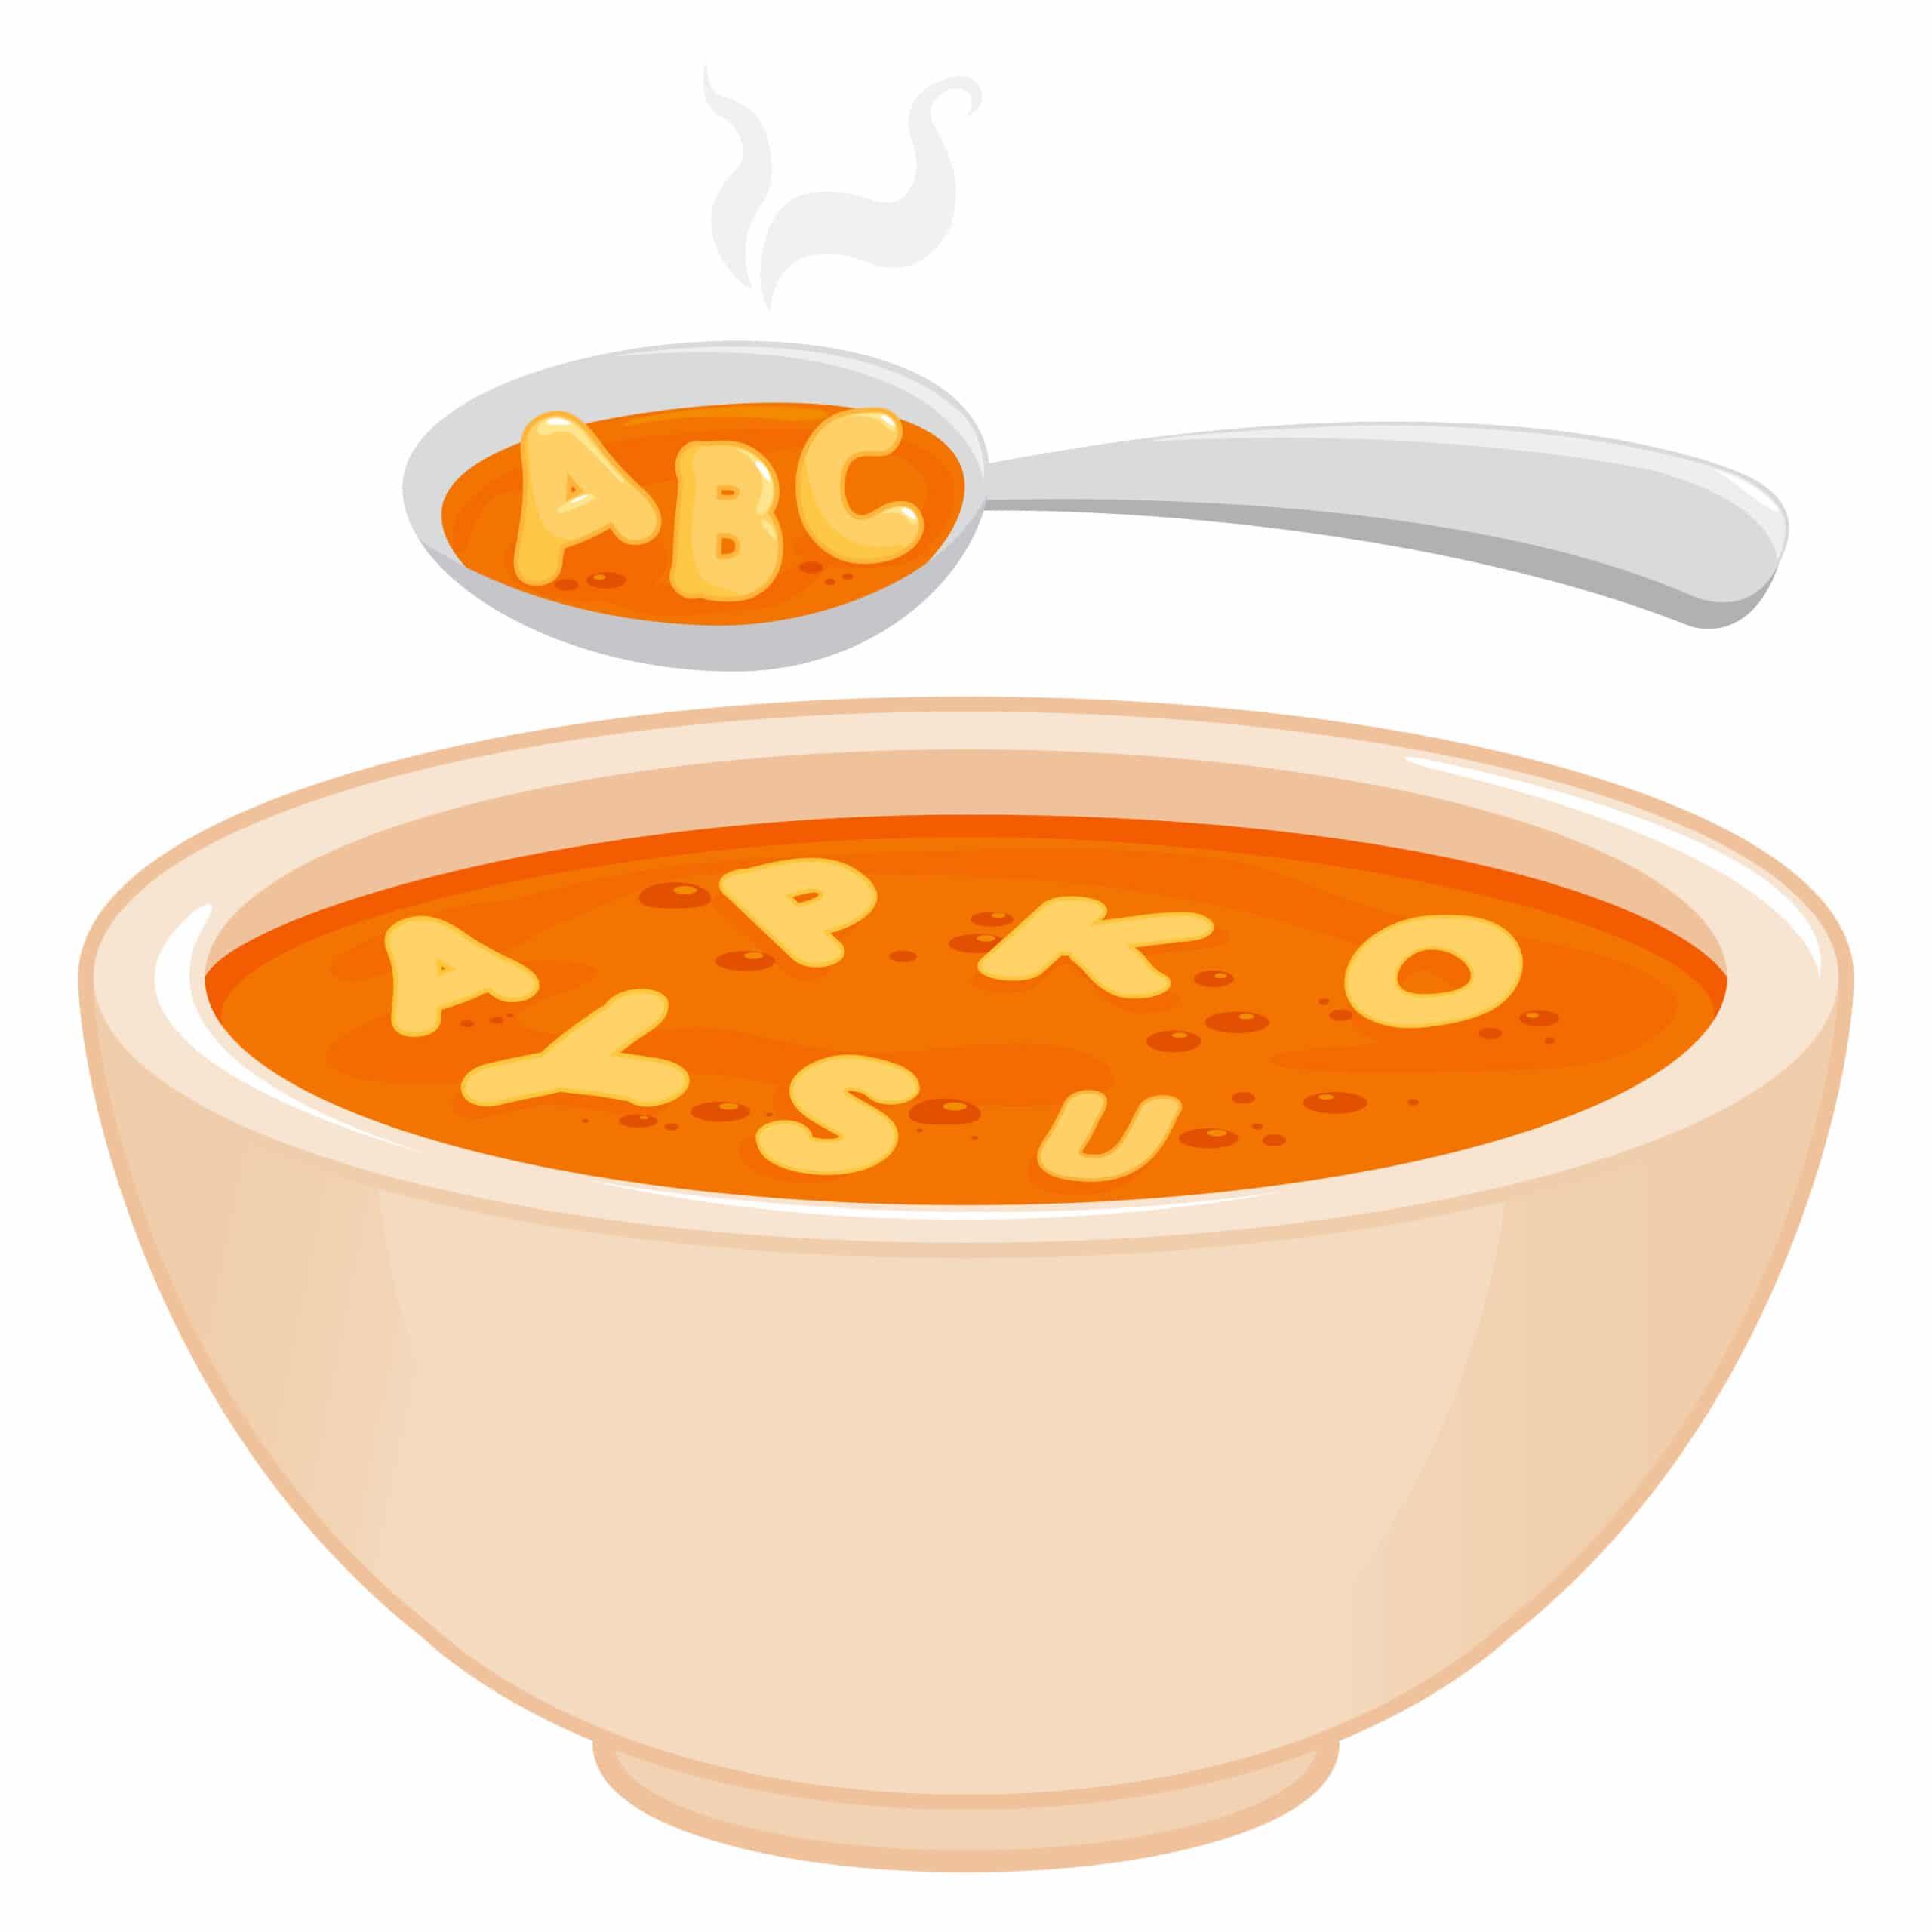 Translatting Acceptance criteria from alphabet soup